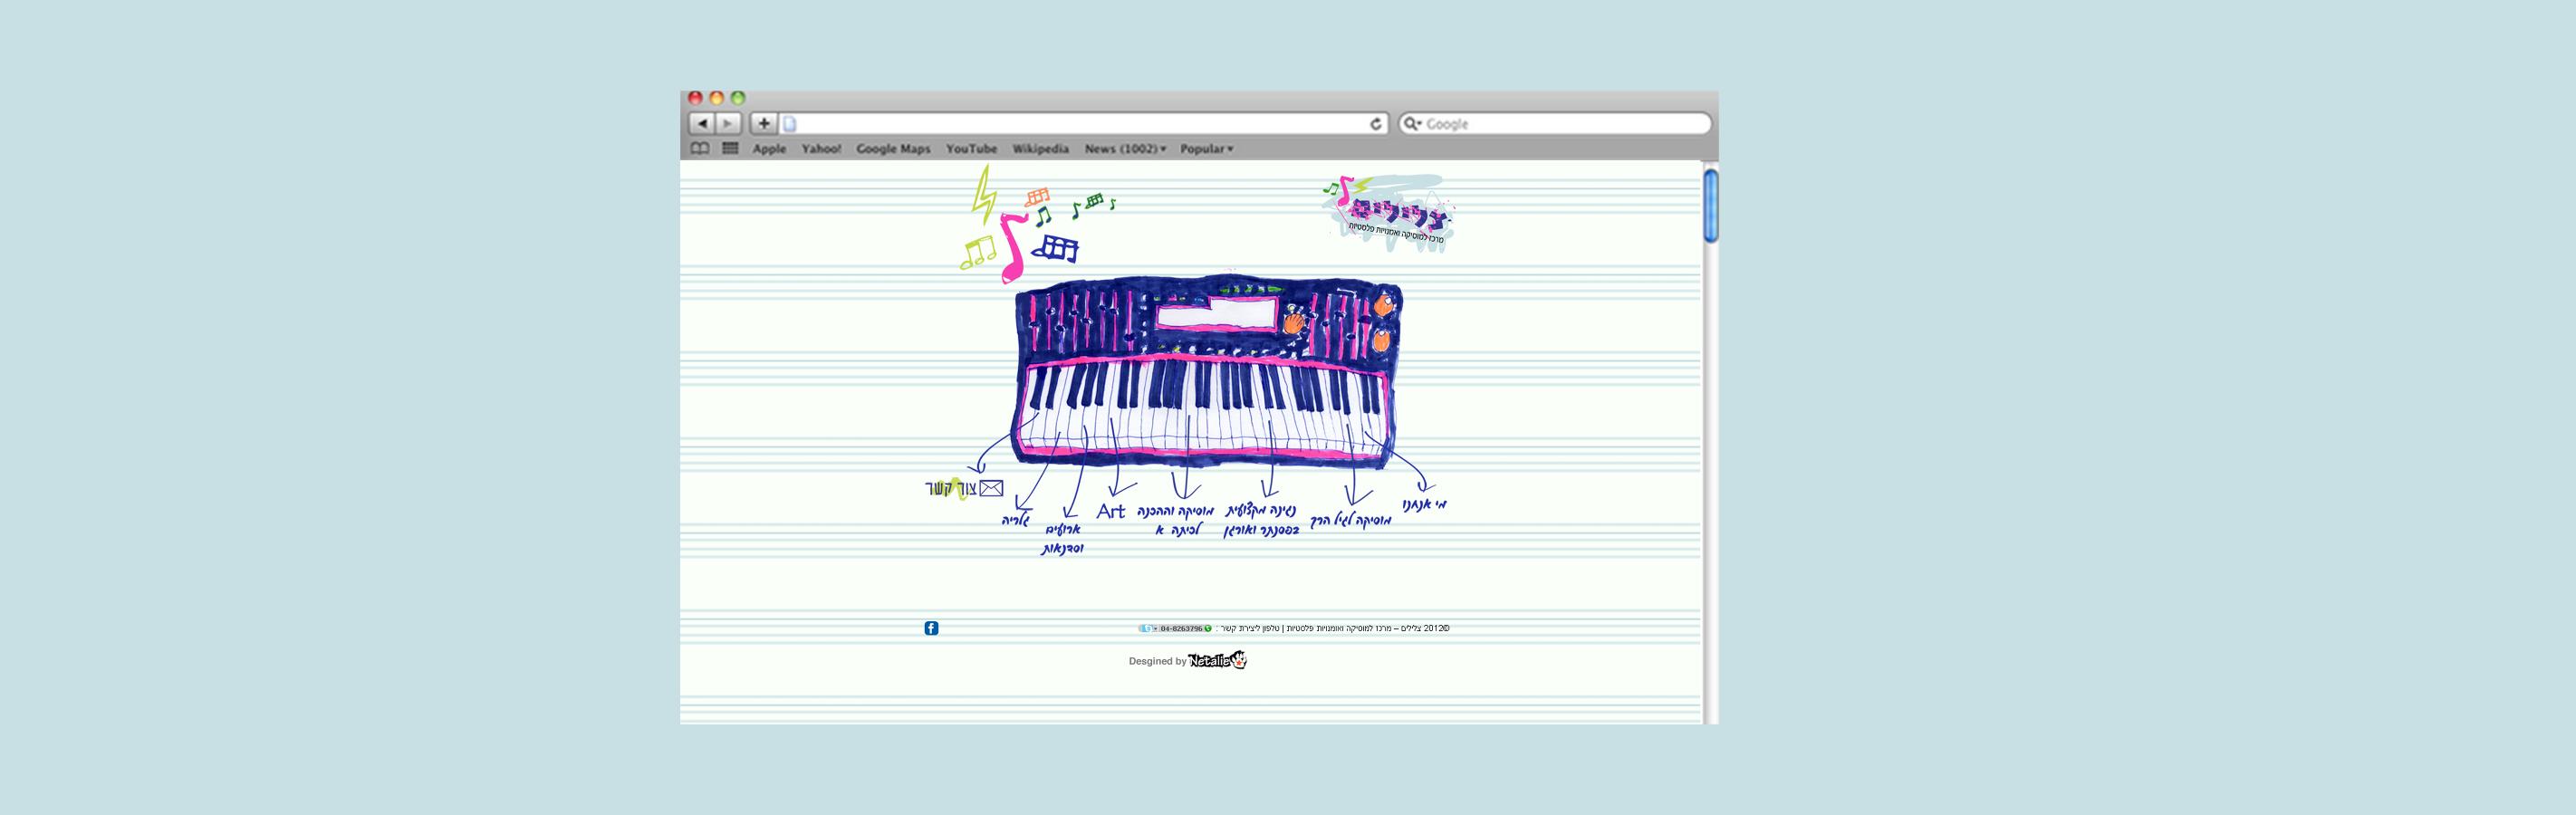 zliim web site-music school